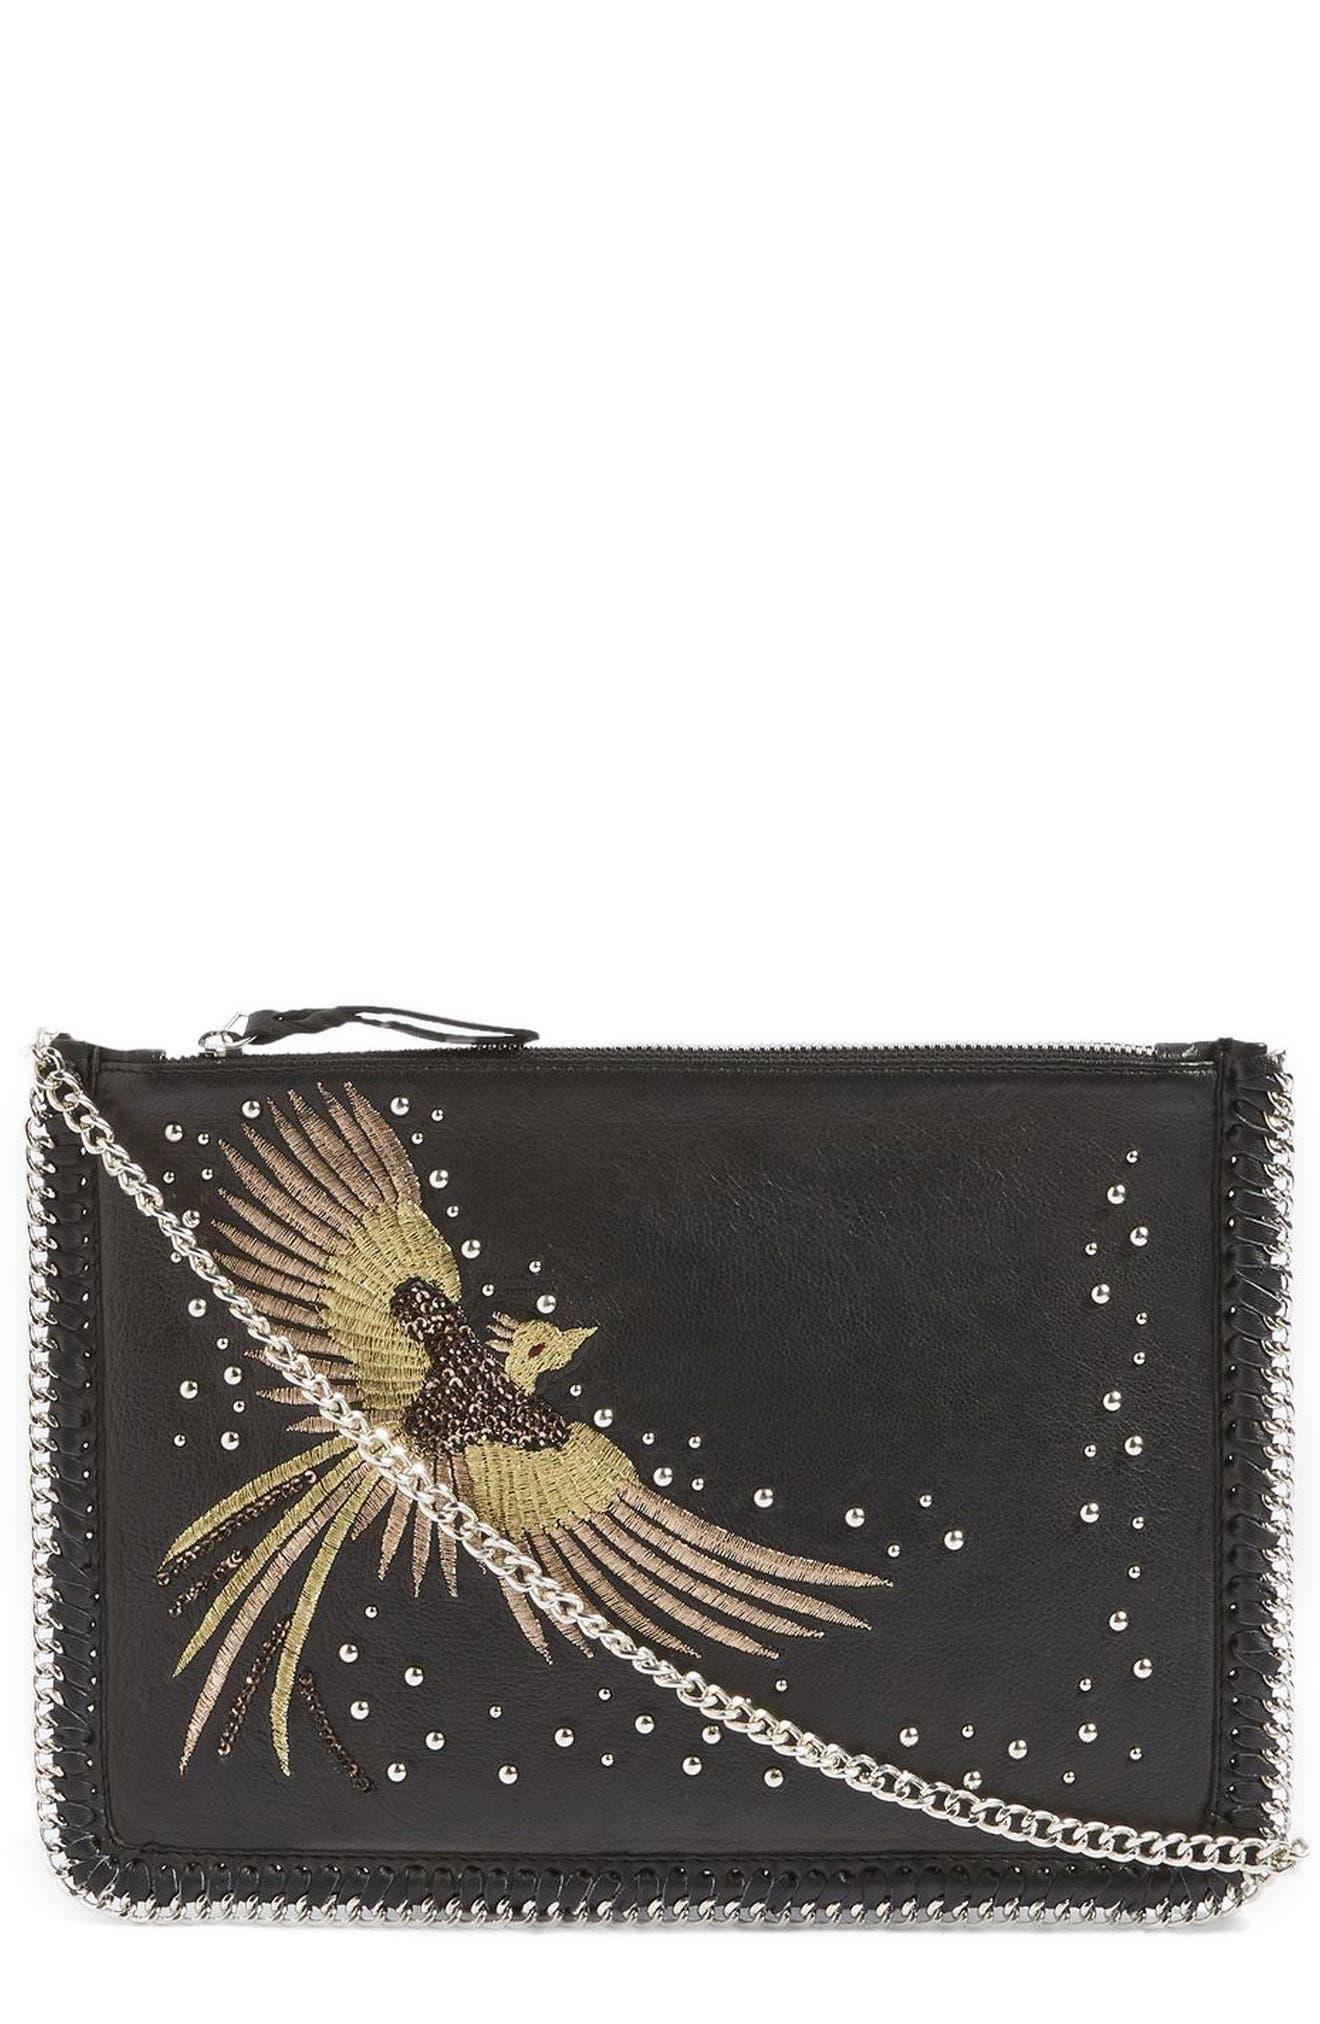 Topshop New Ava Bird Leather Crossbody Bag